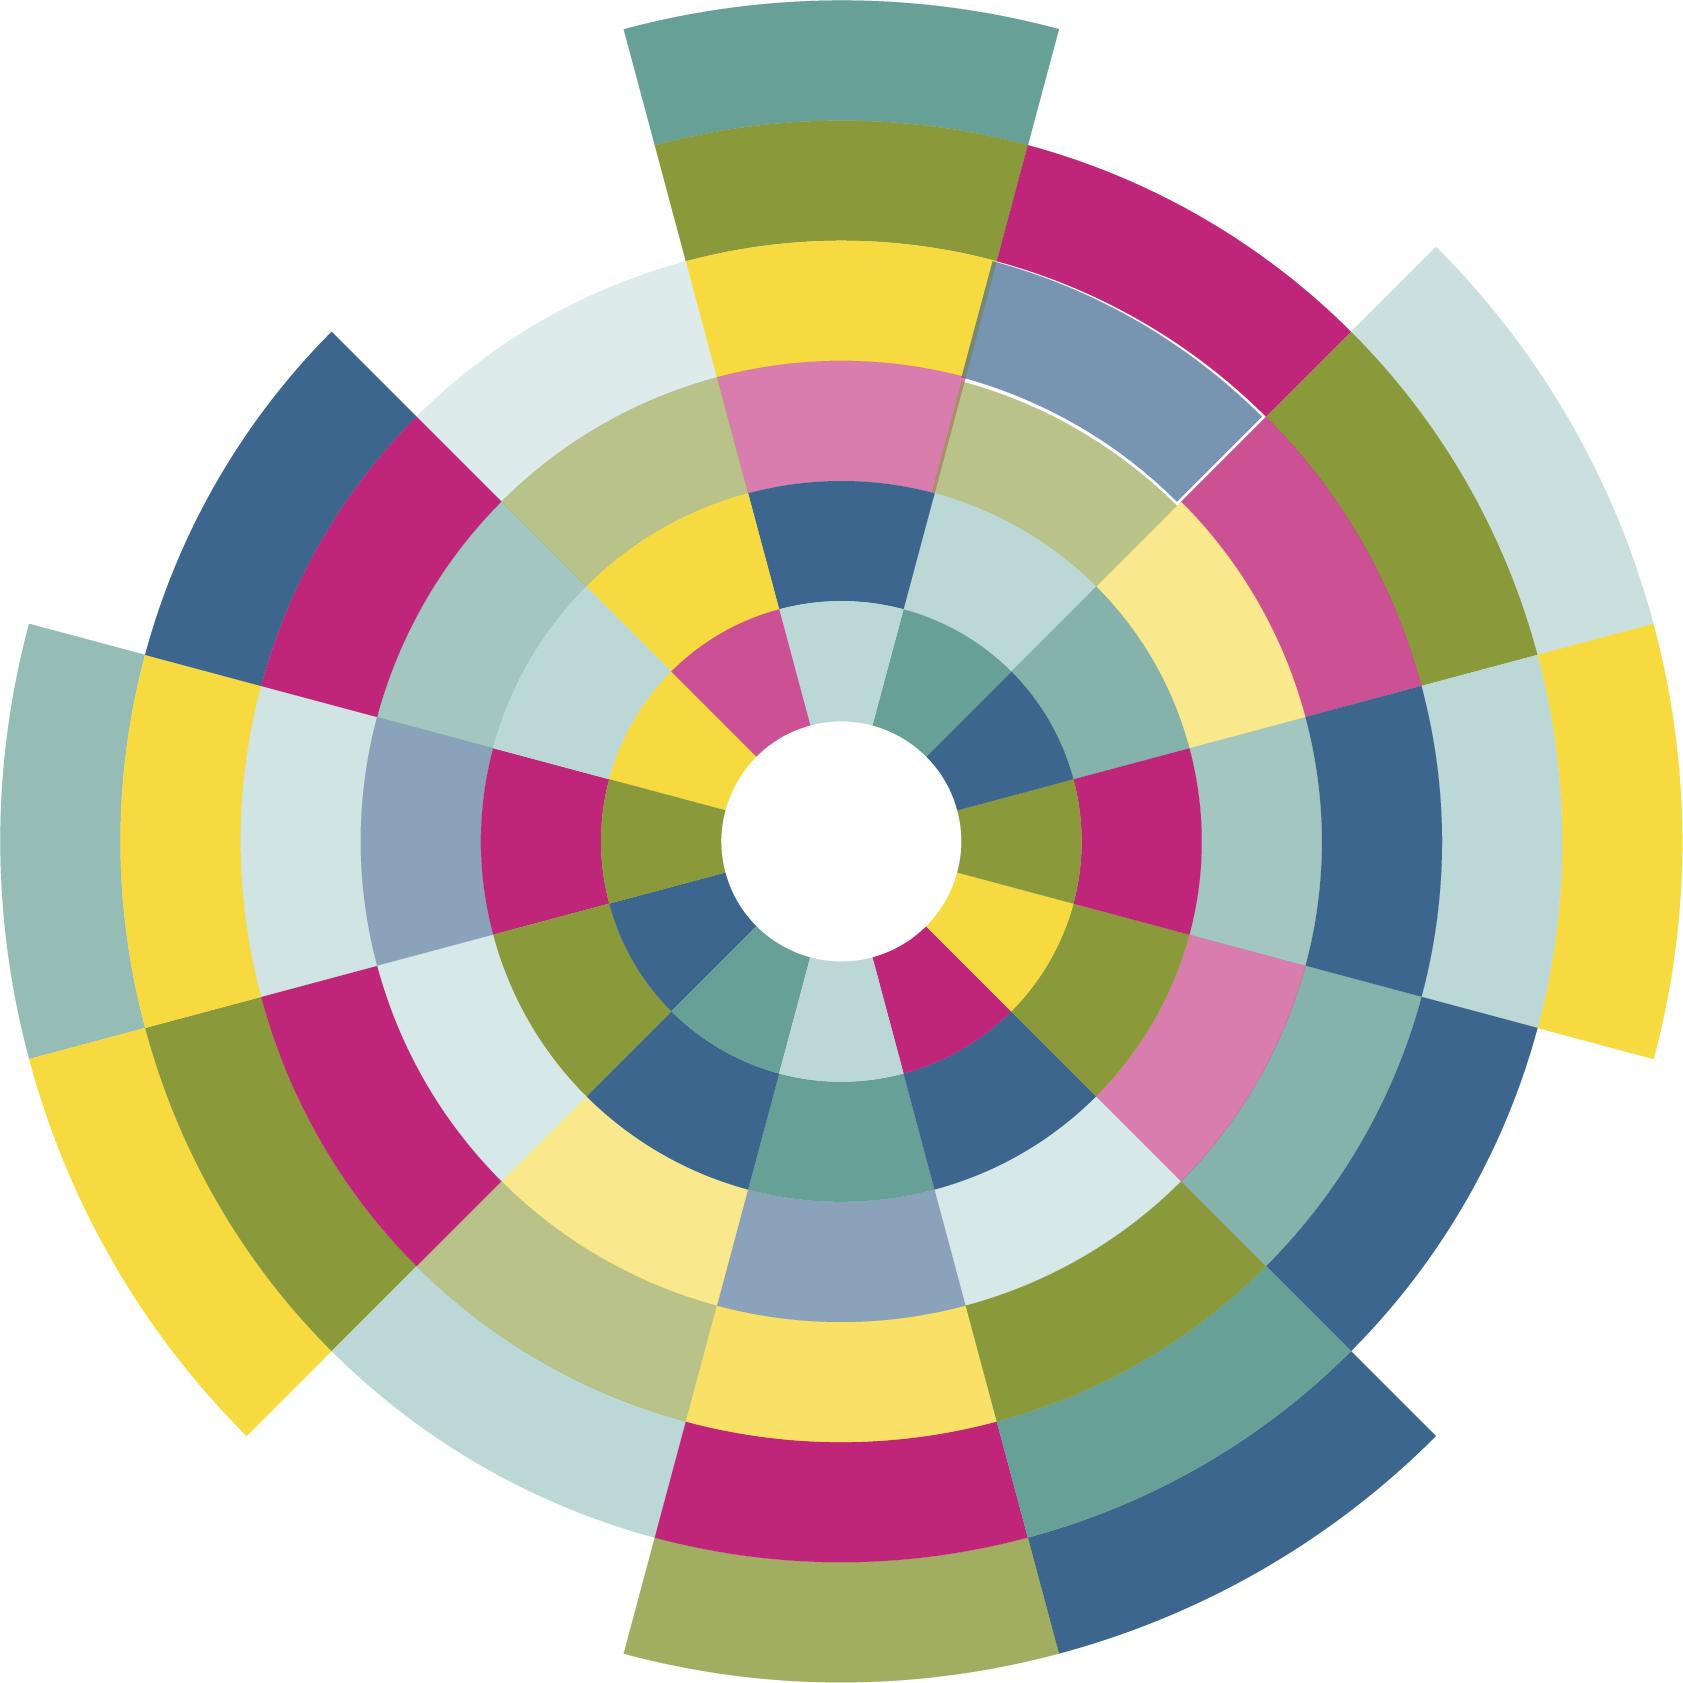 Community Planning Network in Scotland